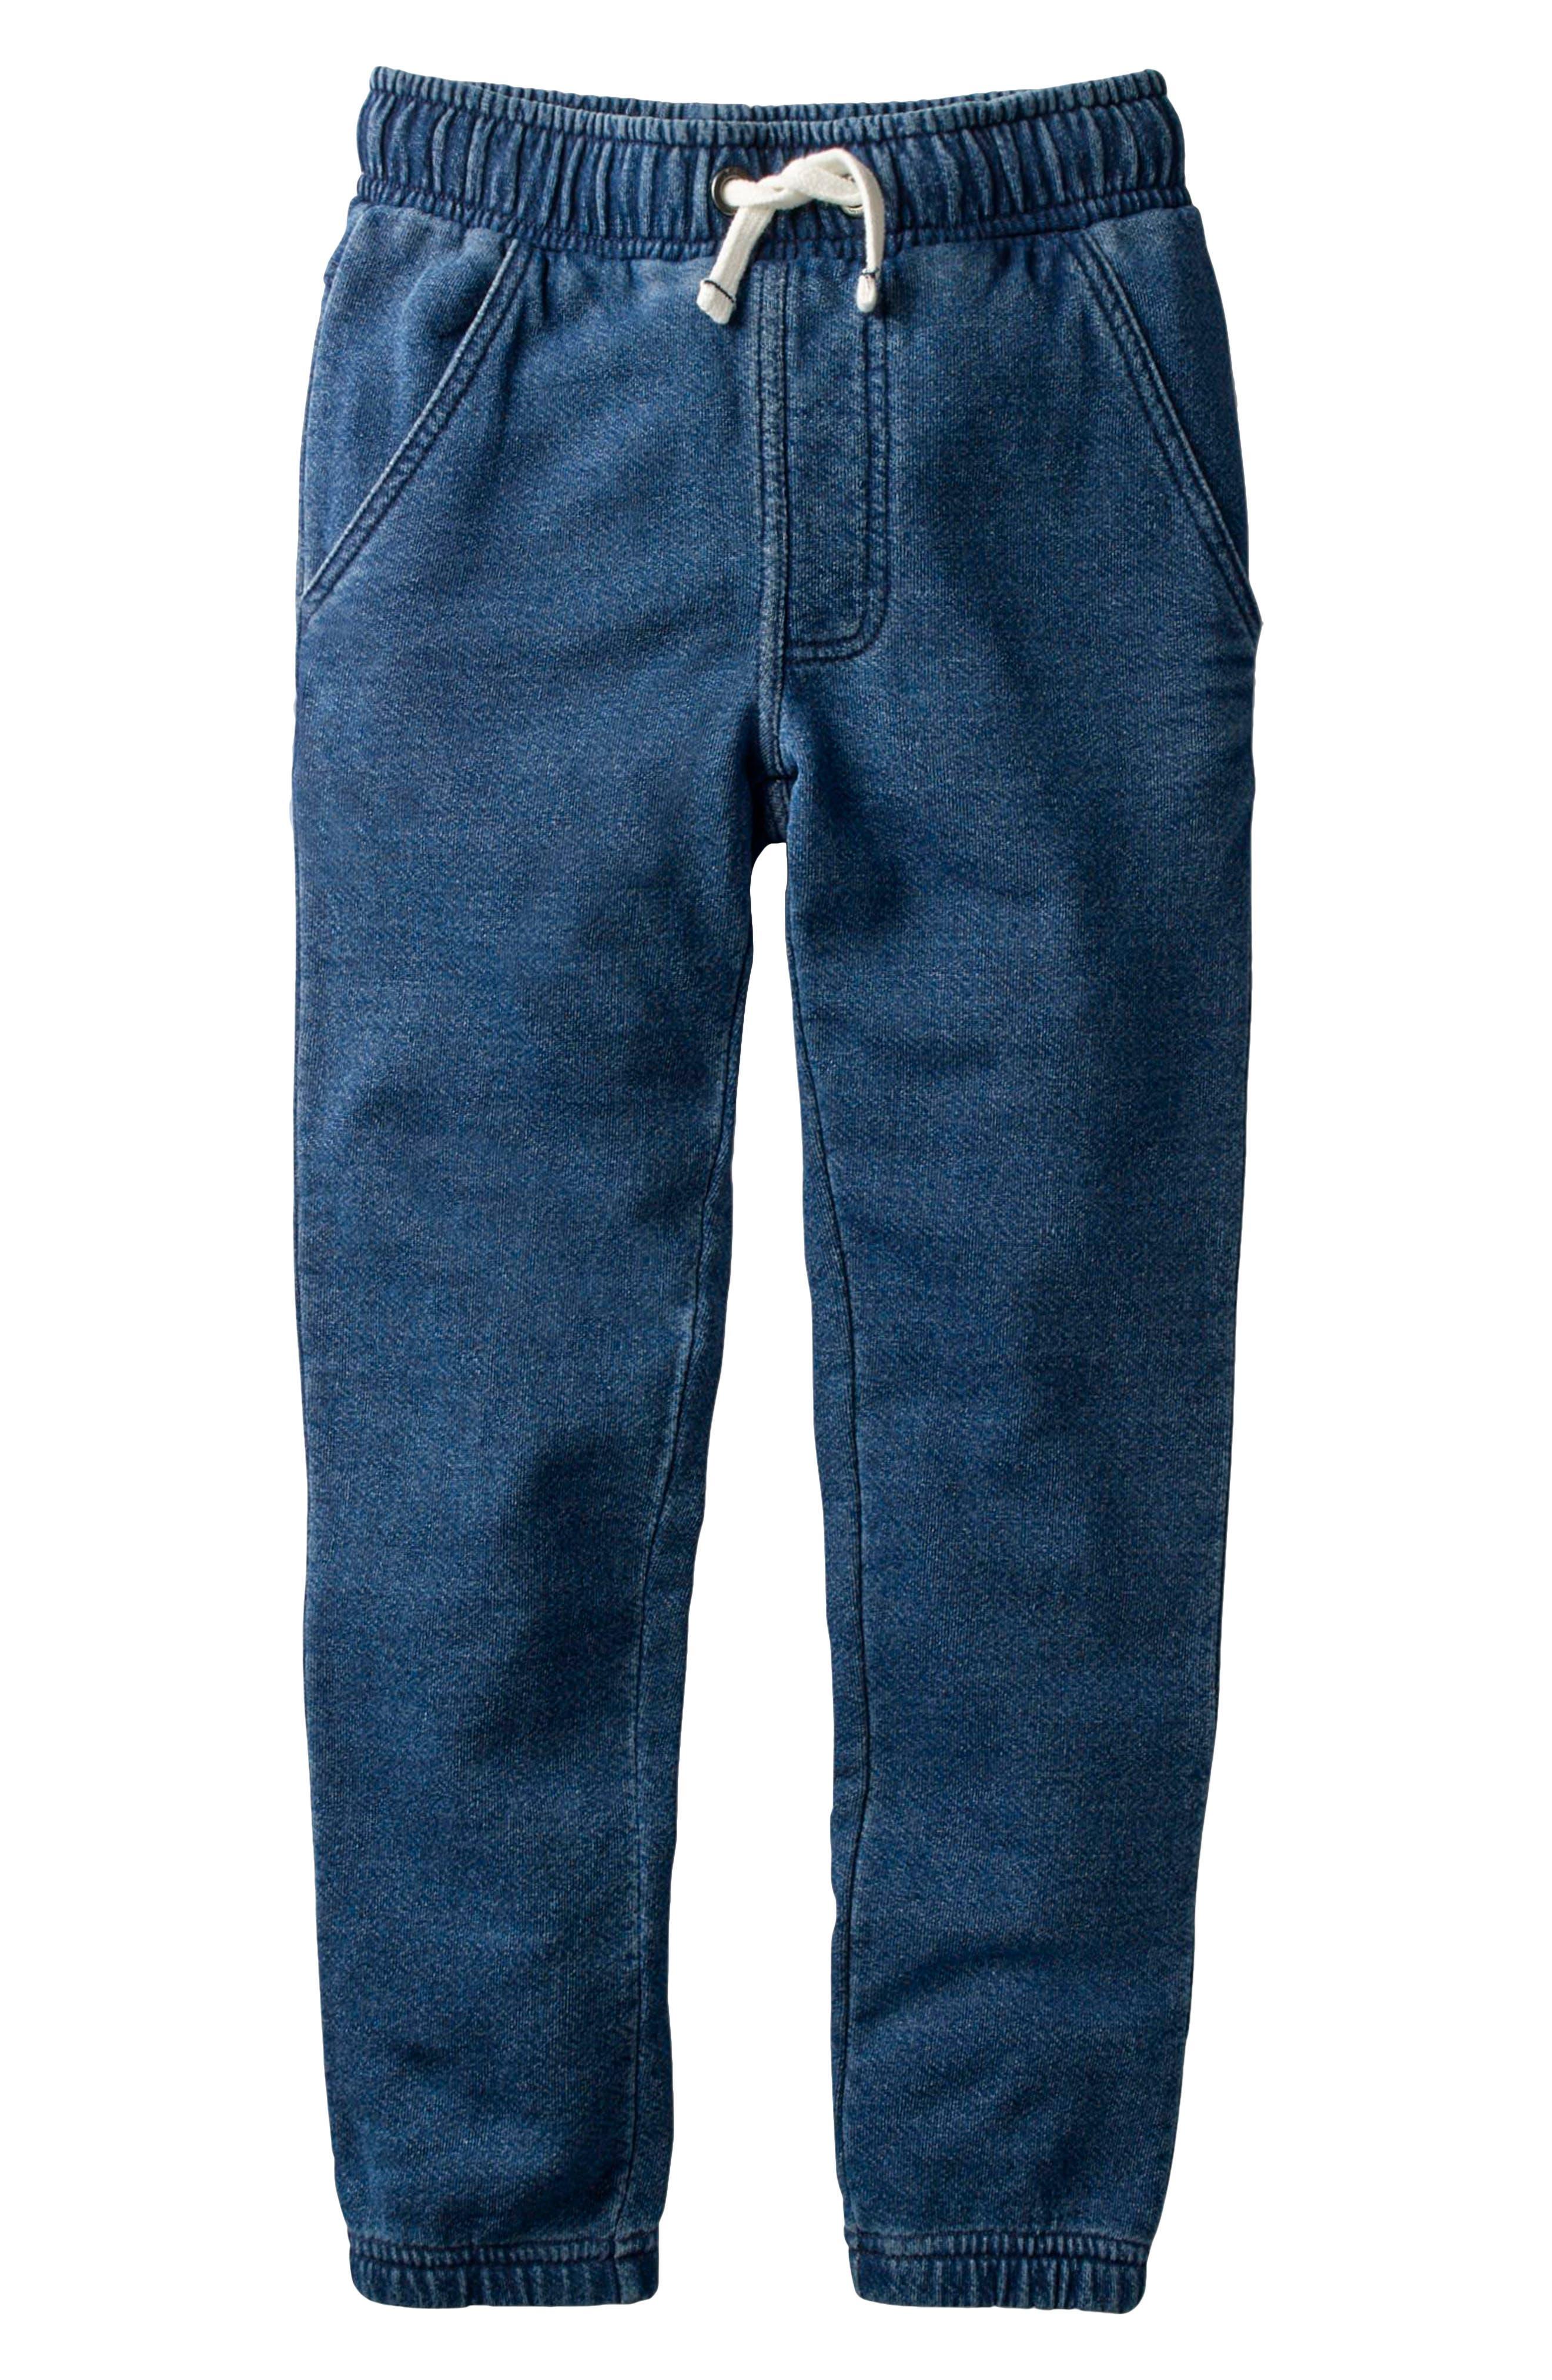 Jogger Pants,                         Main,                         color, 414